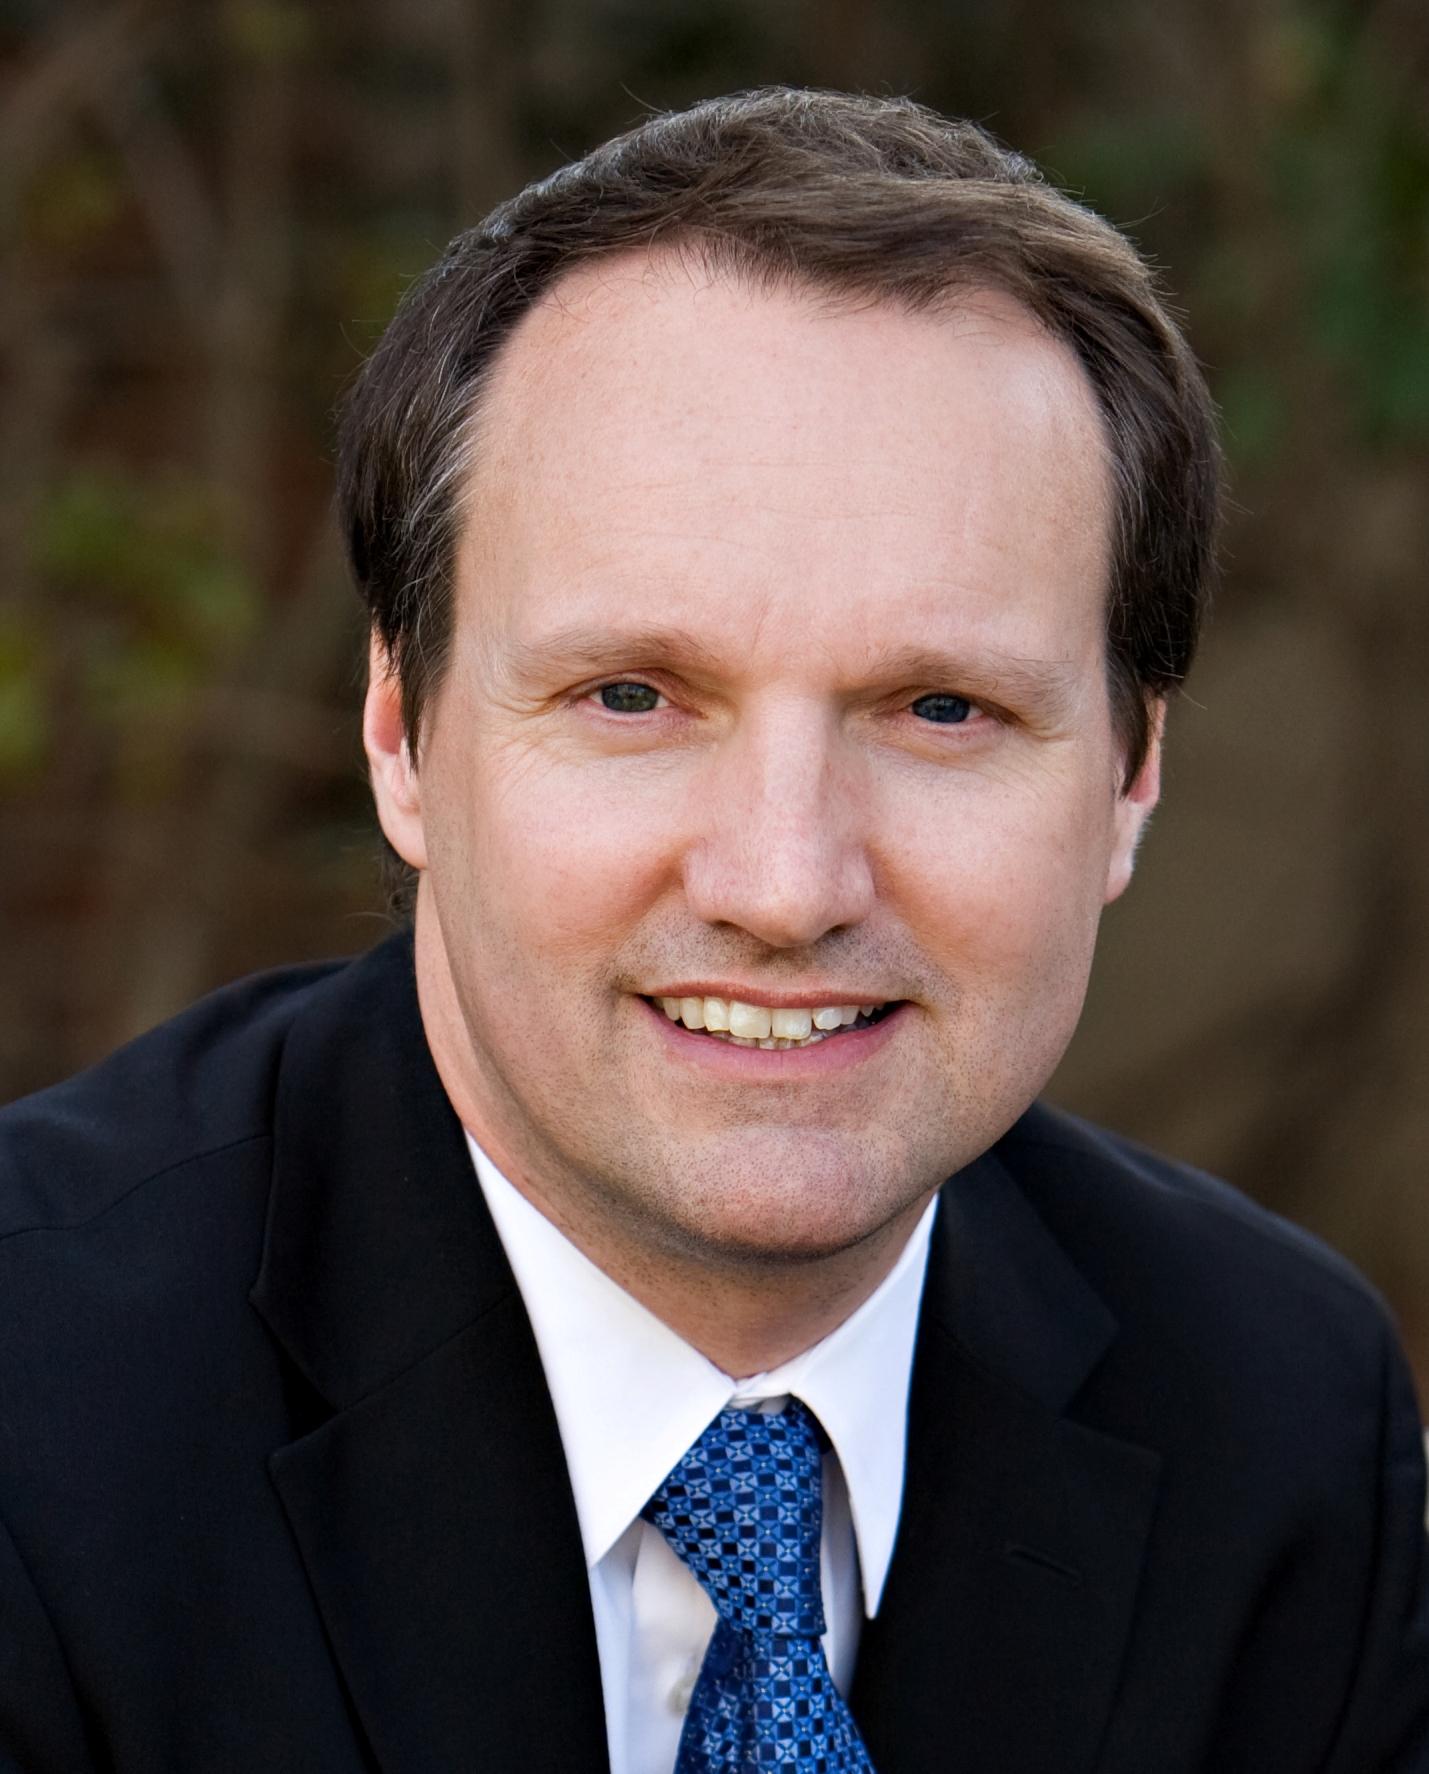 Alan MacCormack